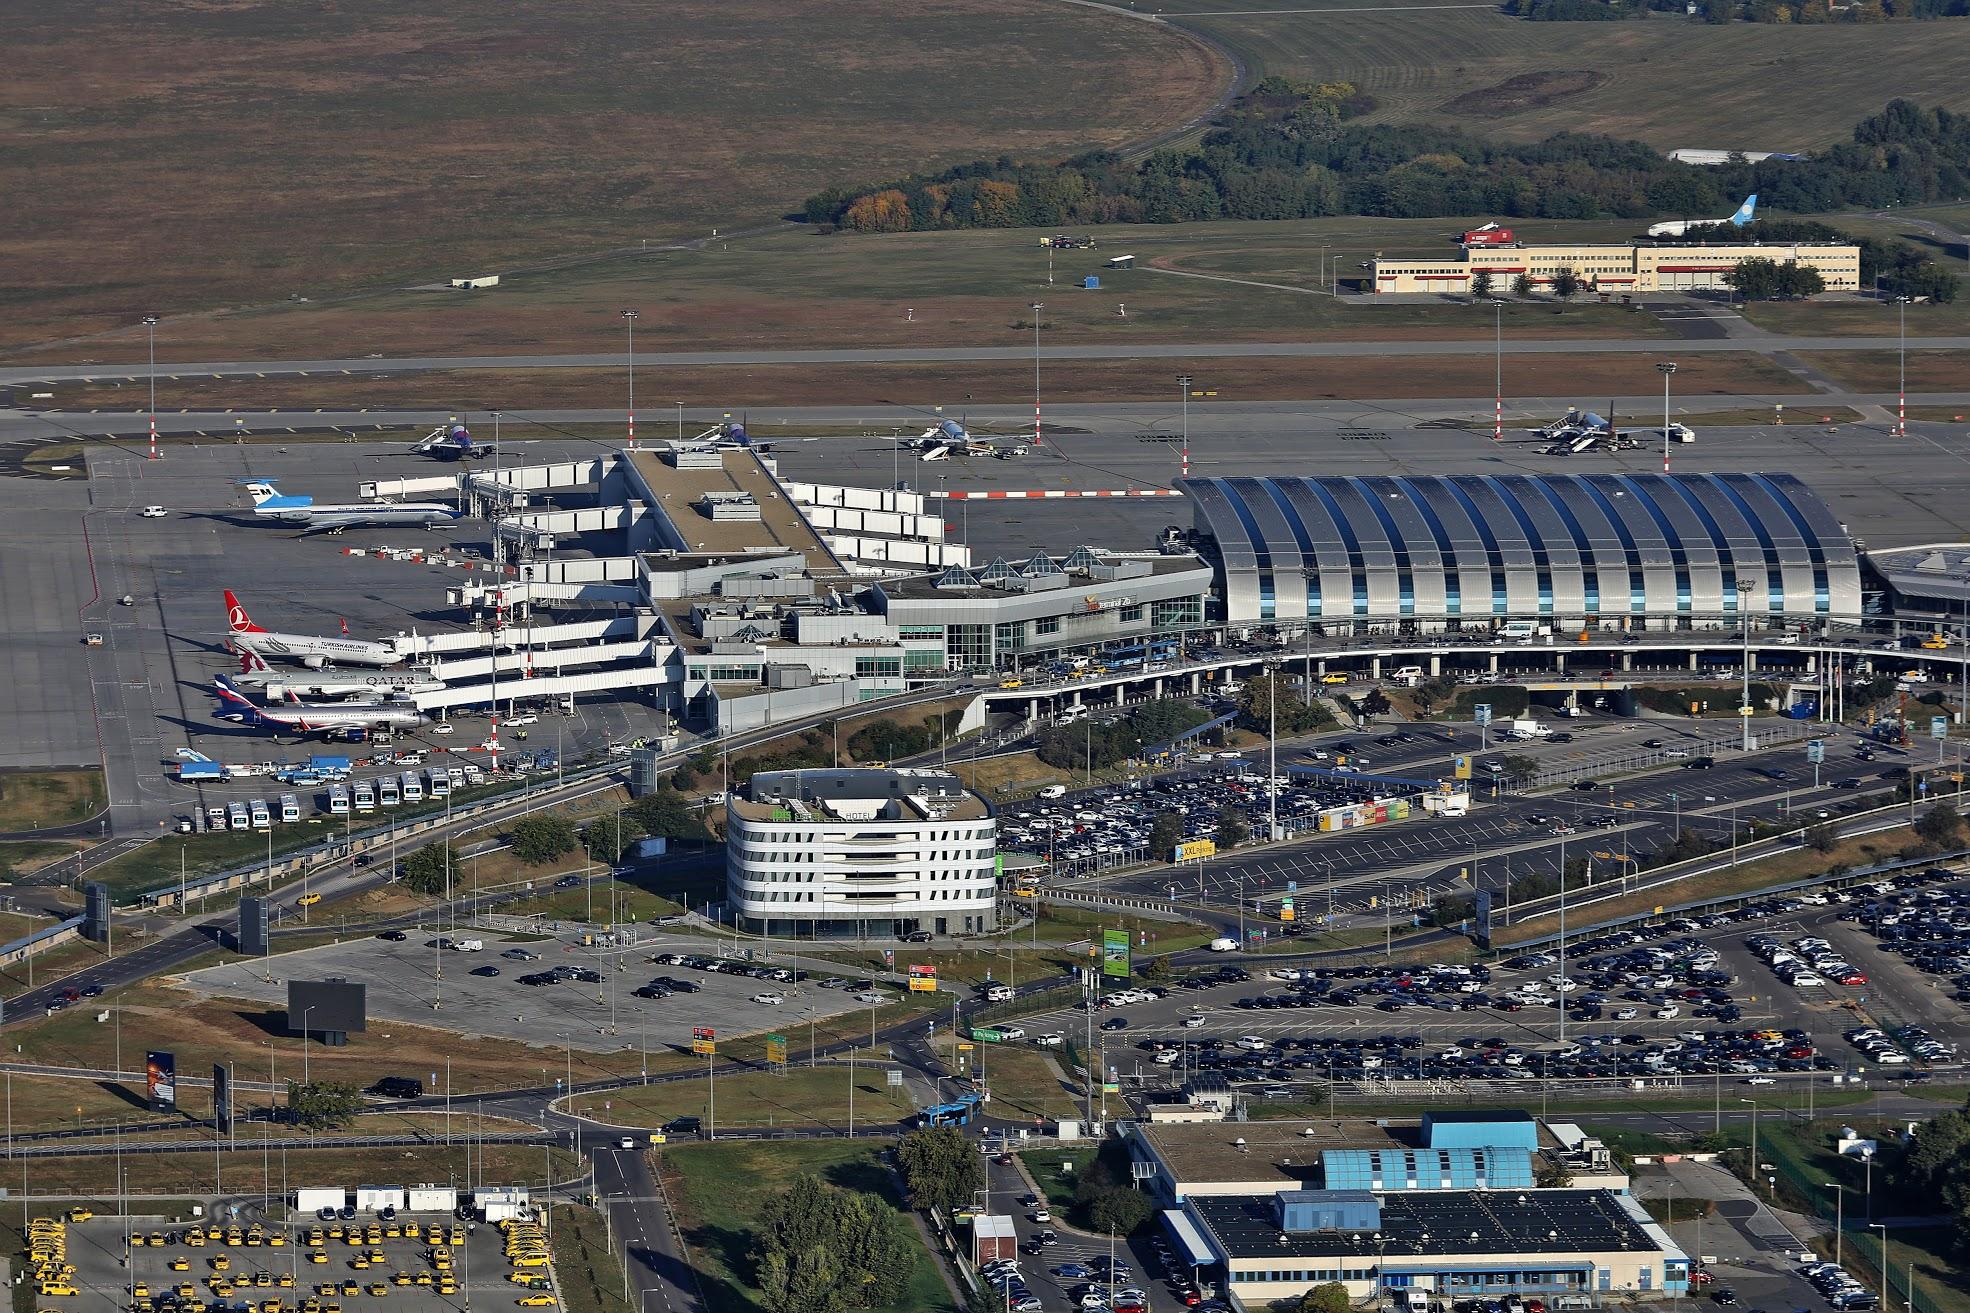 budapest airport 2019